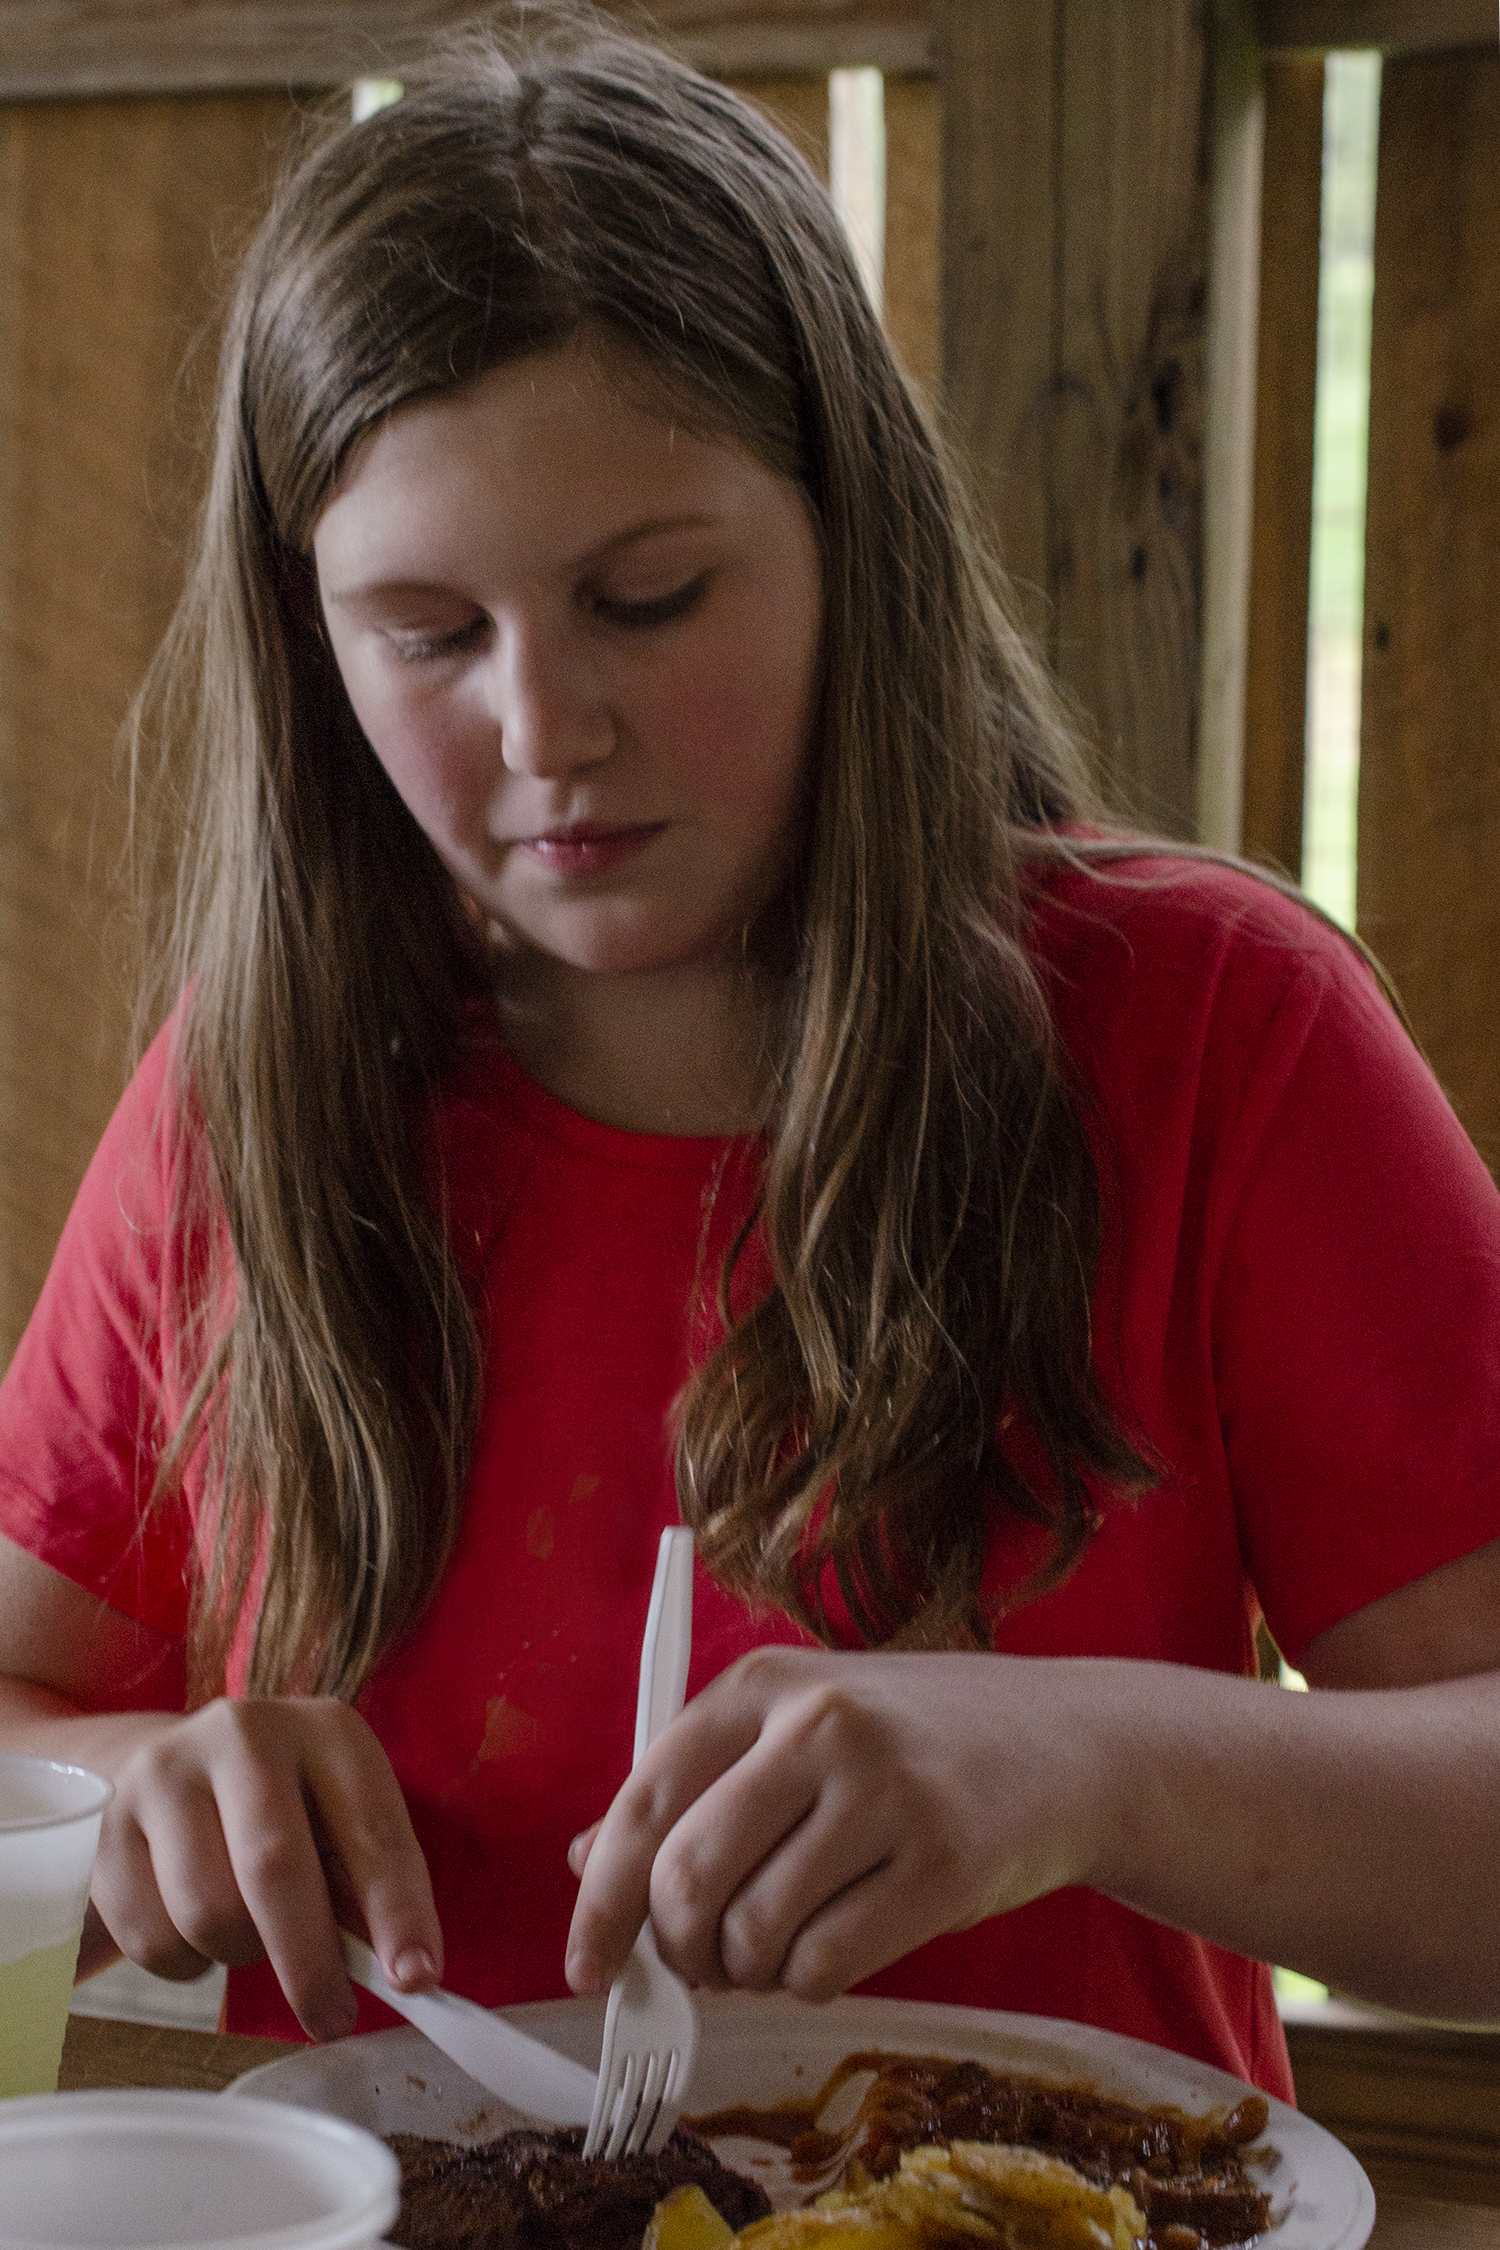 Emilie eating at the Chuckwagon